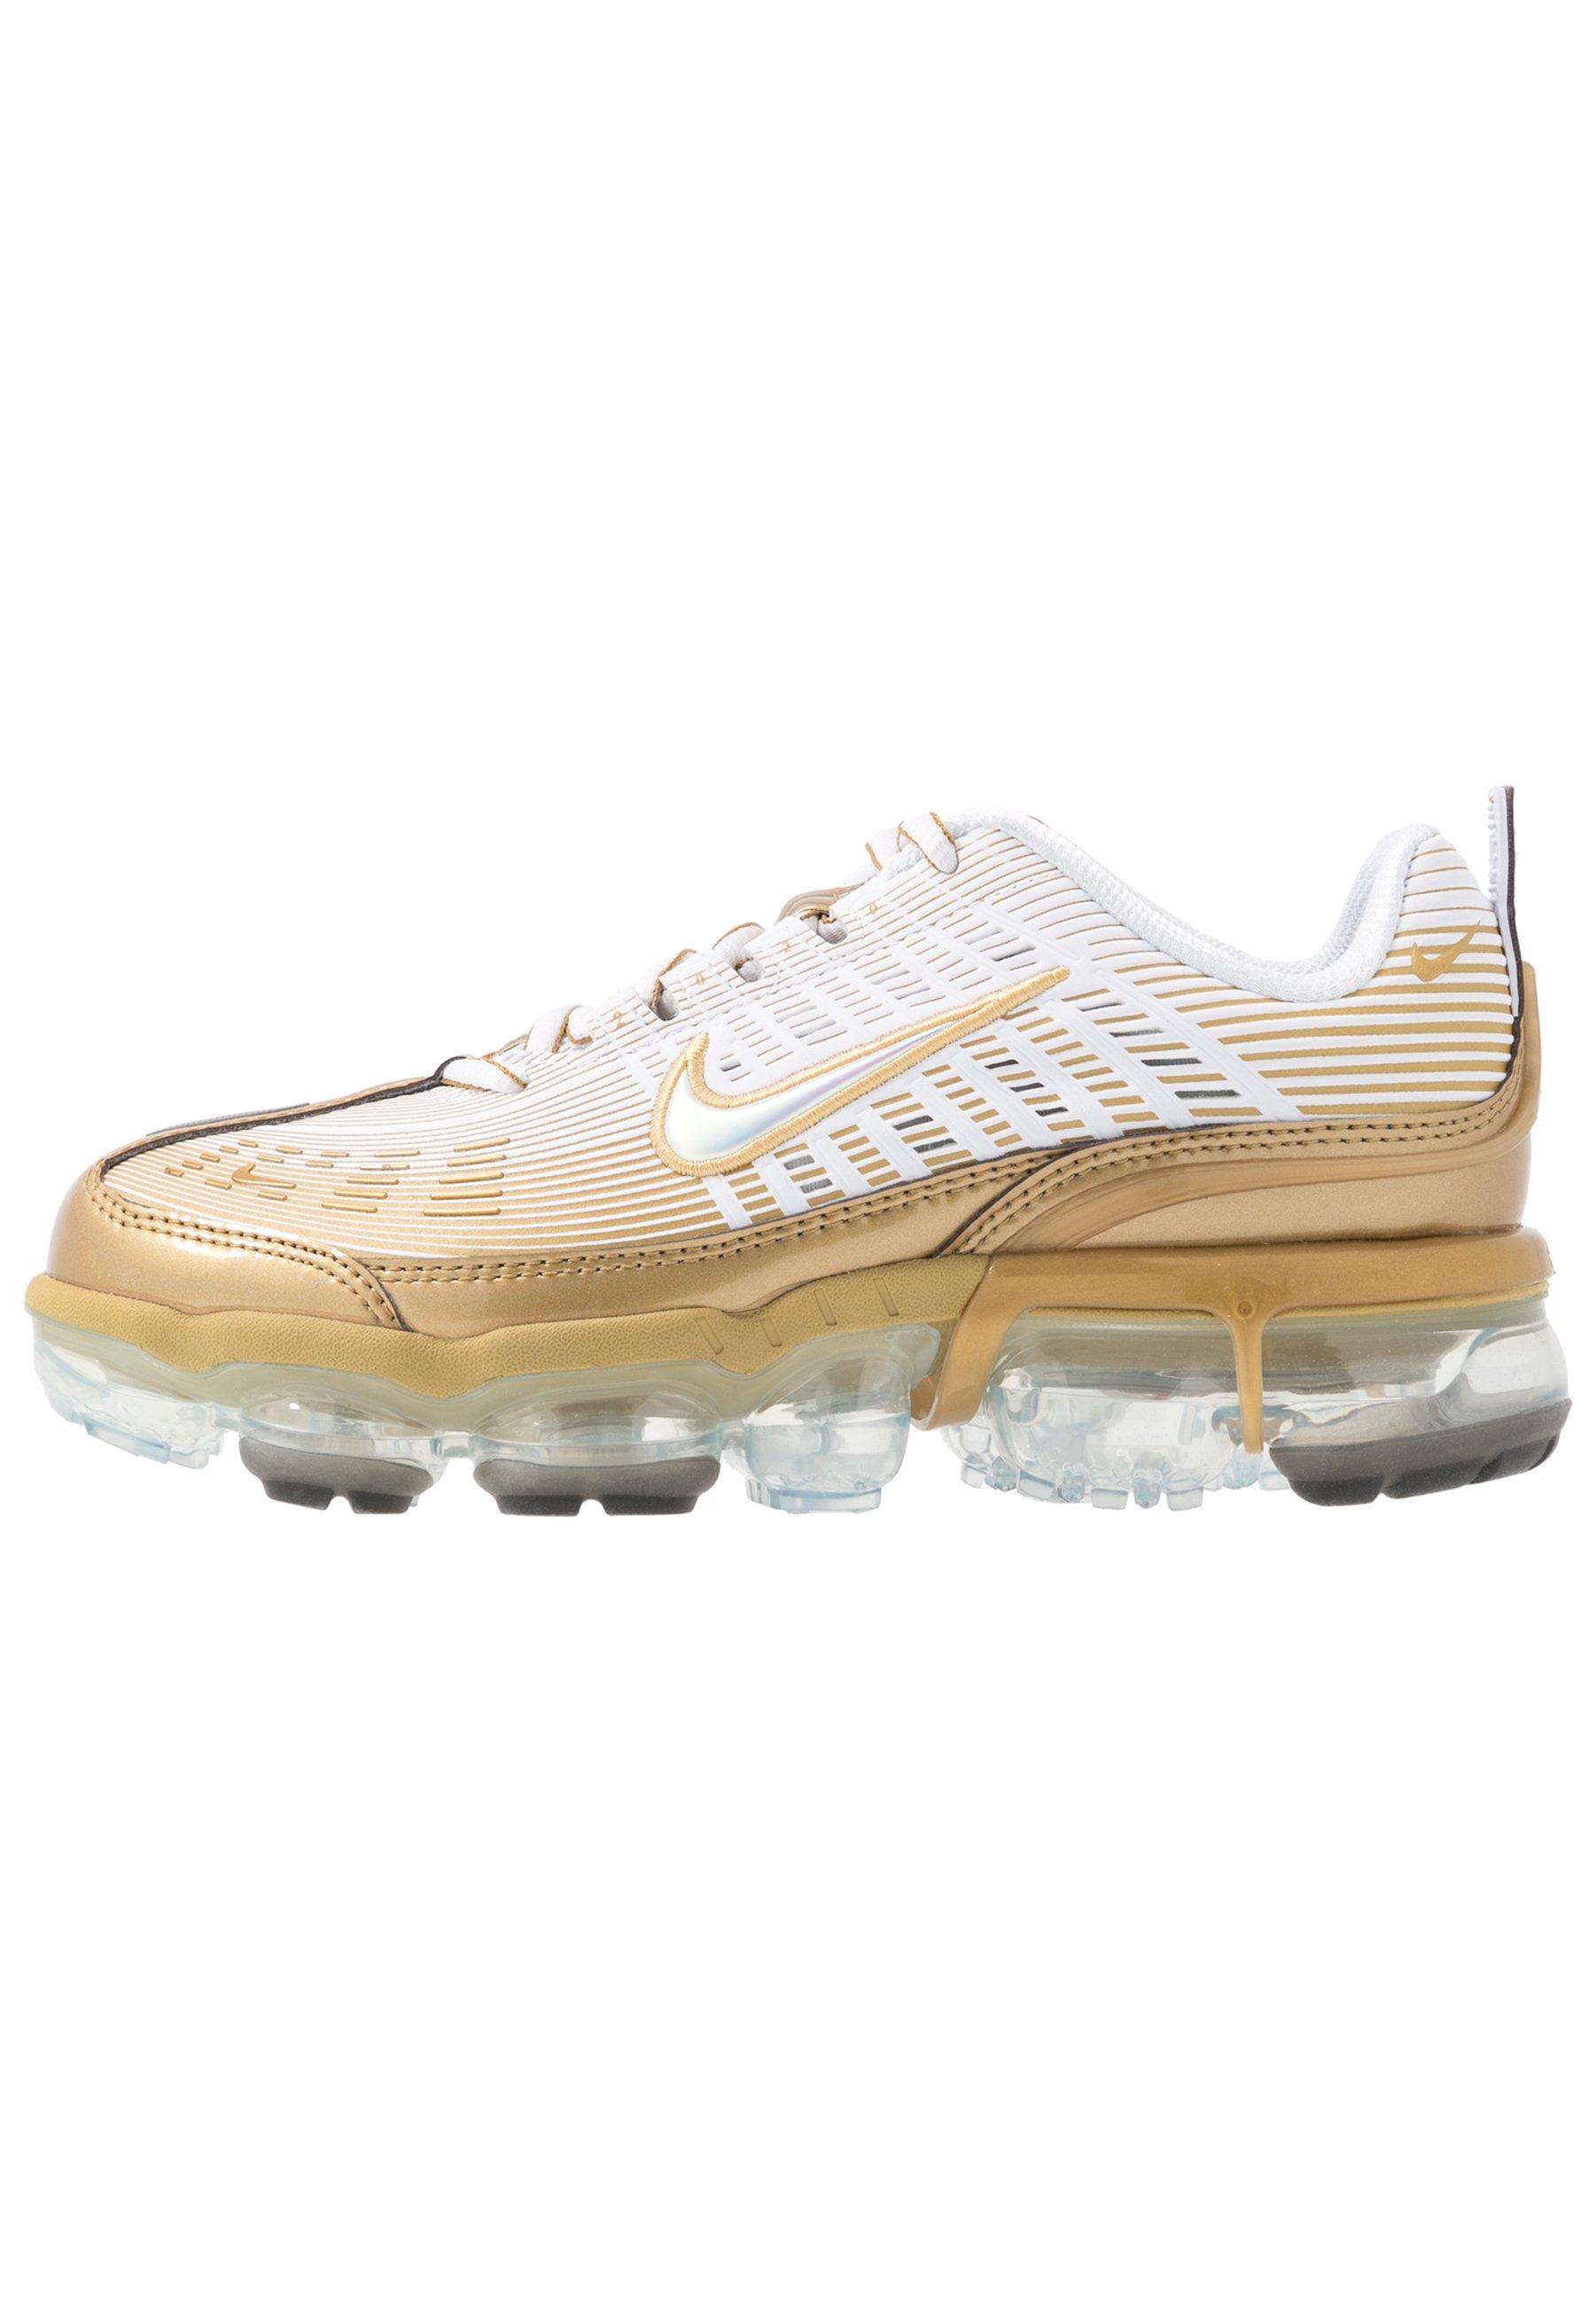 Nike Sportswear AIR VAPORMAX 360 - Baskets basses - white/metallic gold/black/metallic silver